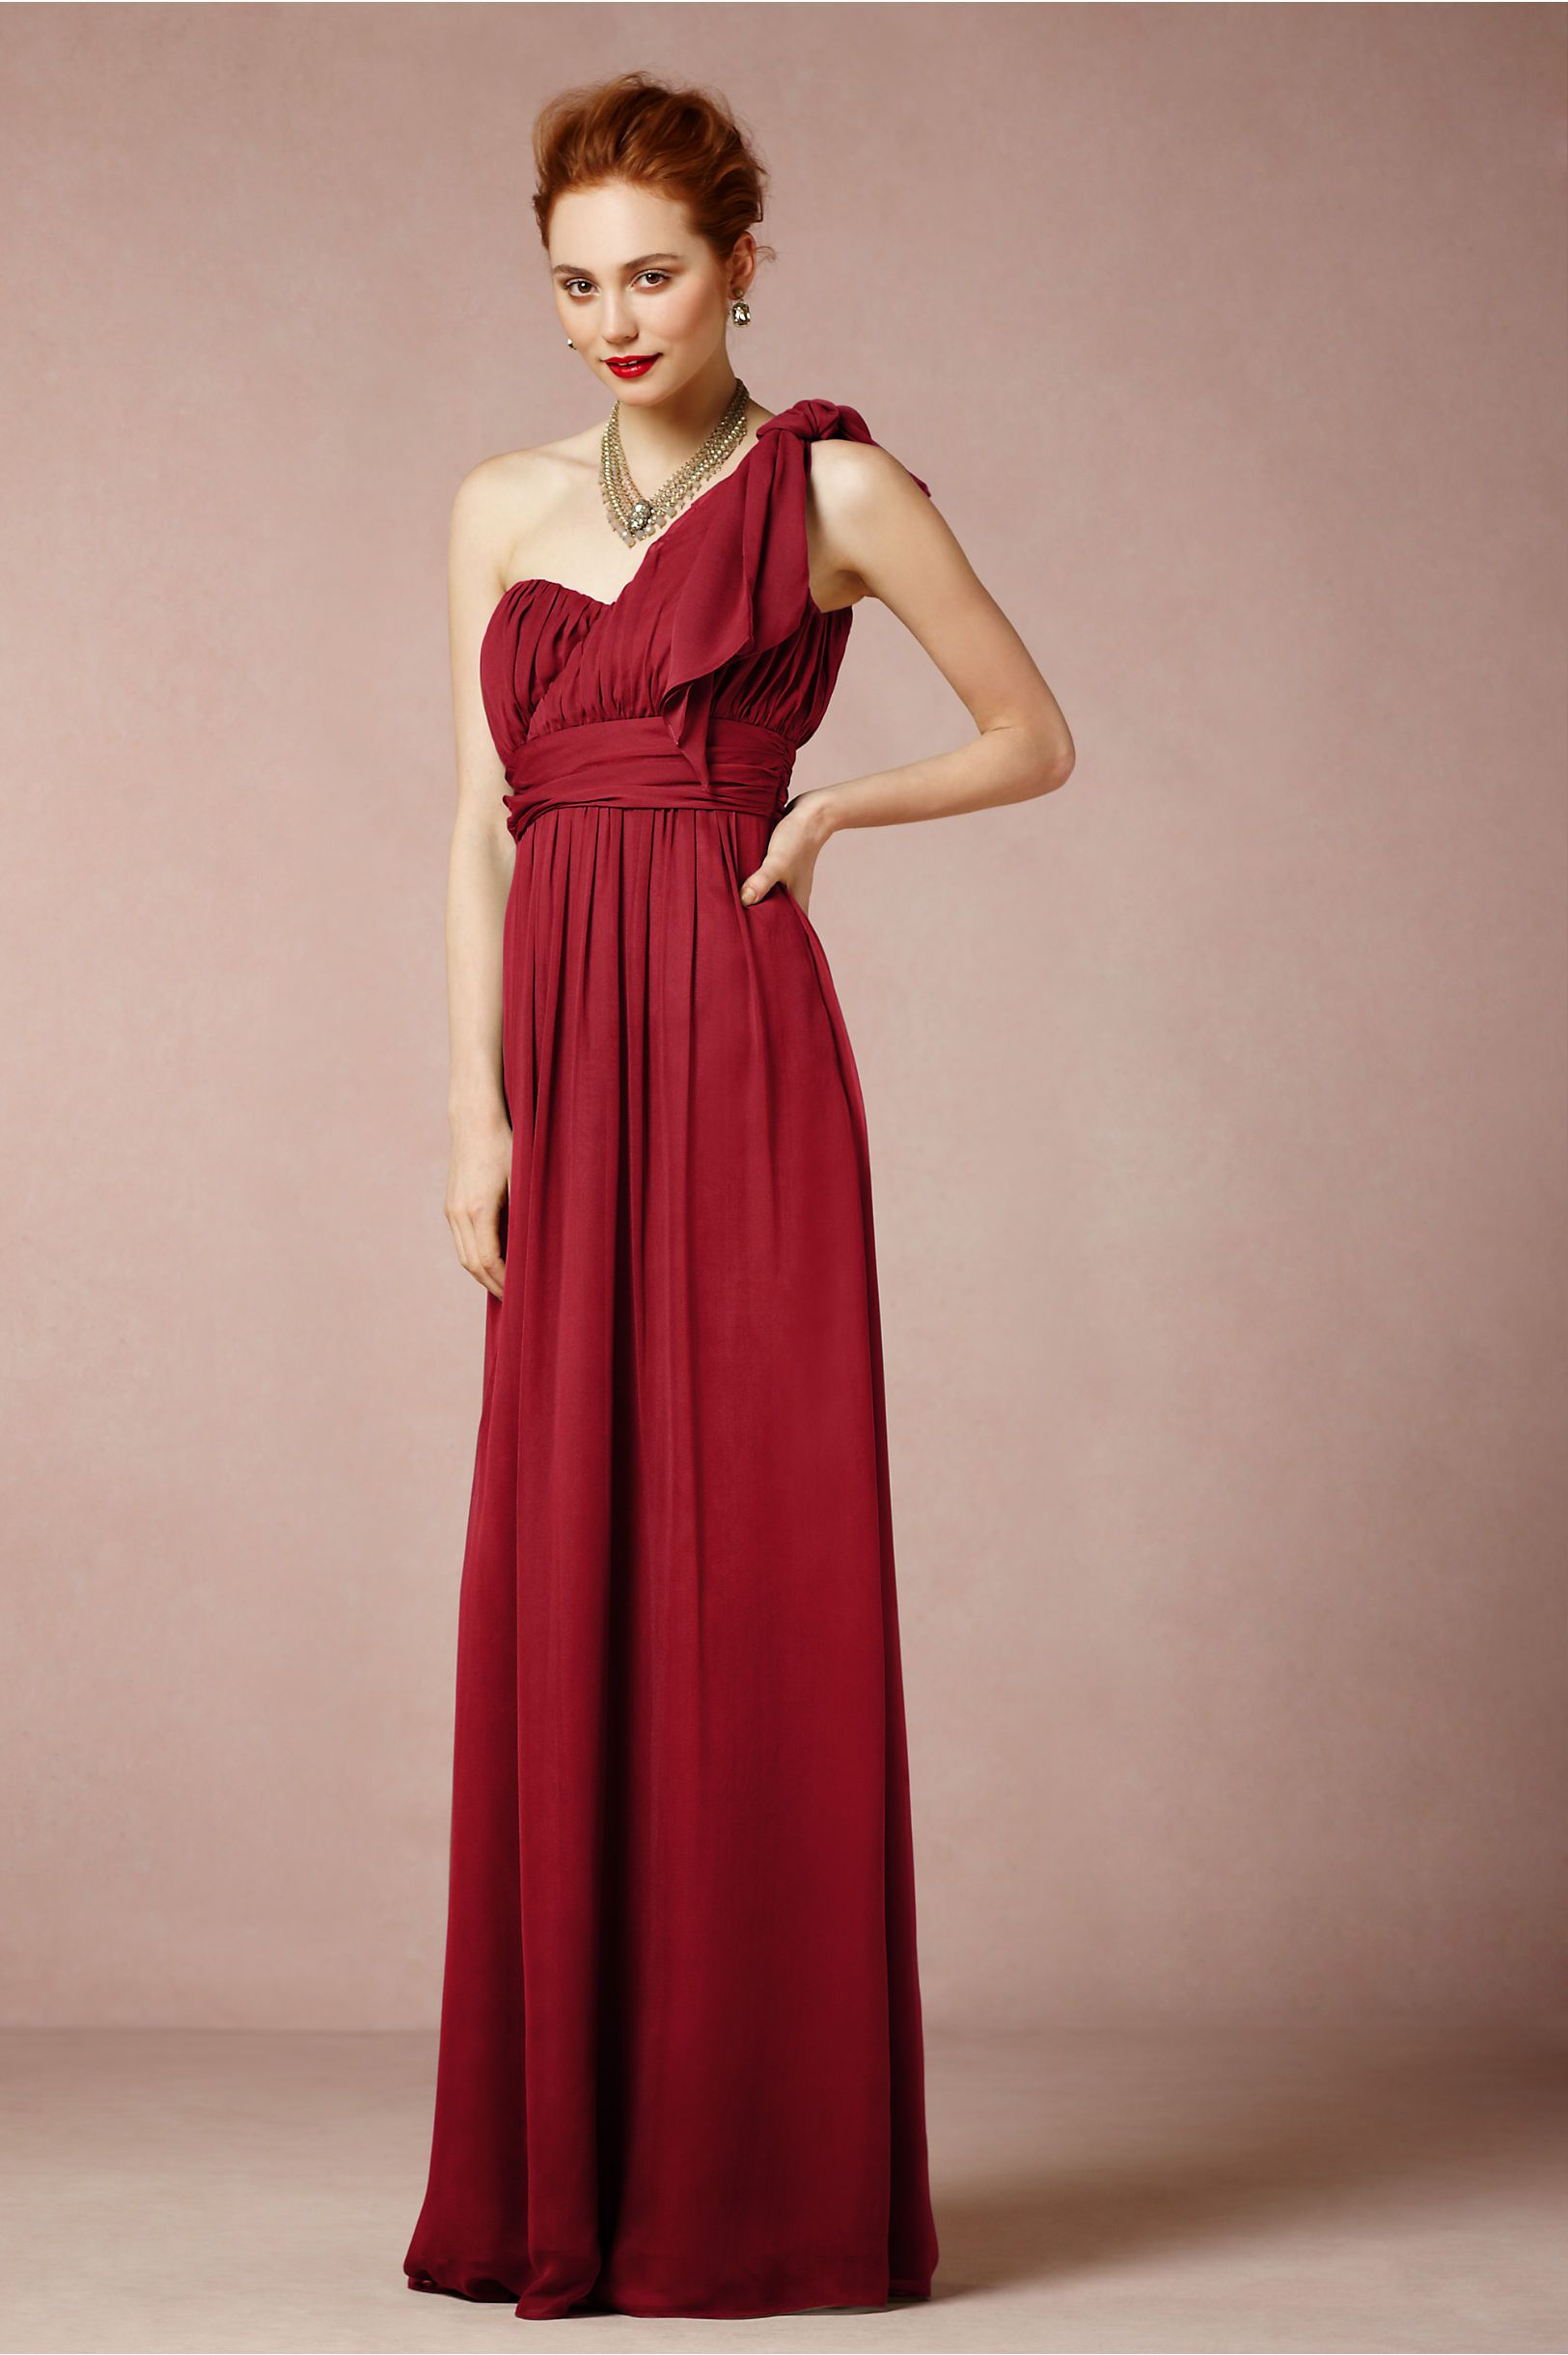 Thalia Maxi Dress from BHLDN | PRAAAM. | Pinterest | Lugares para ...